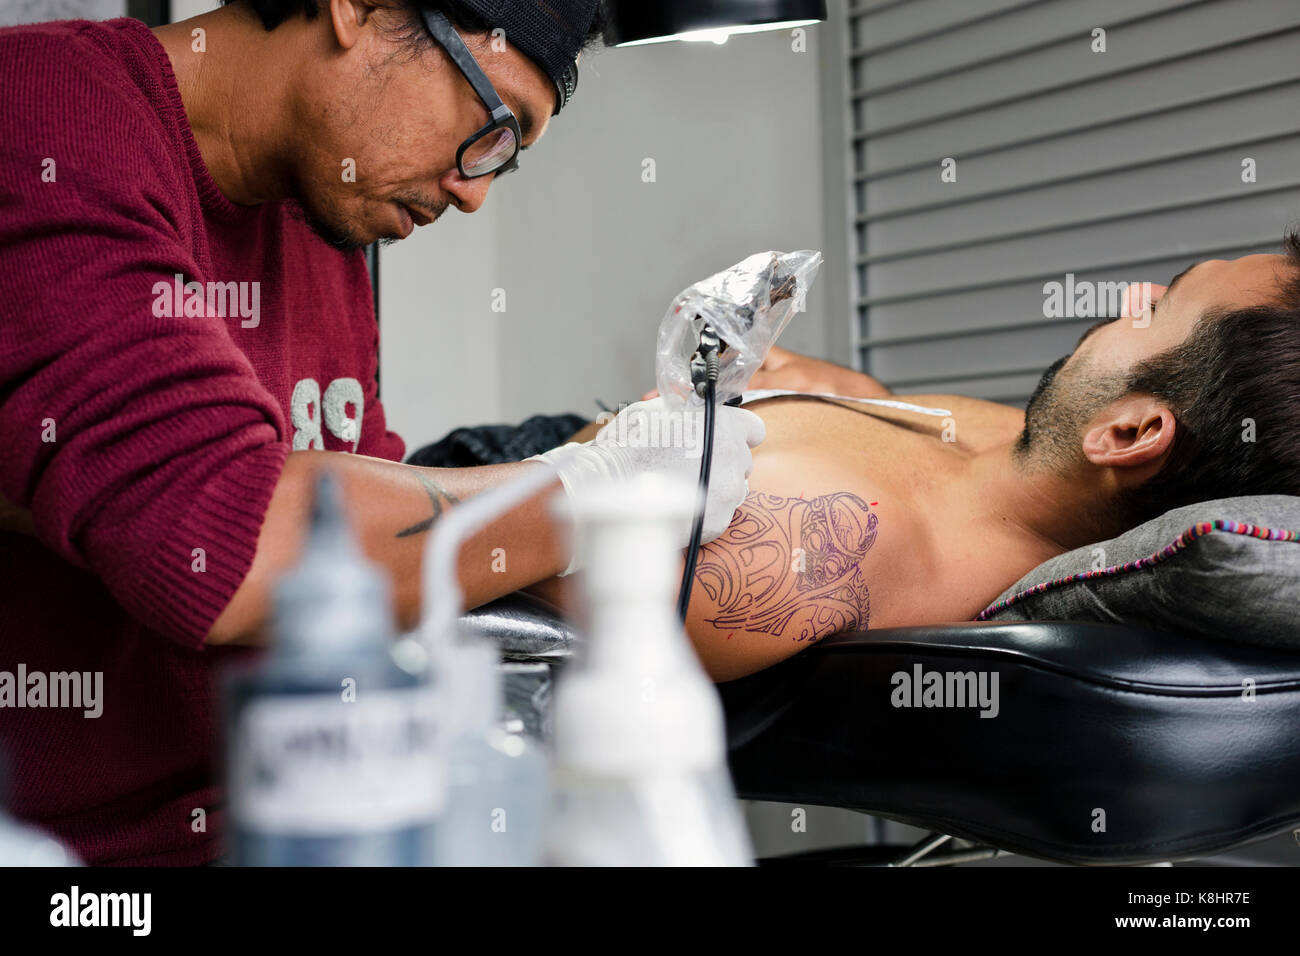 Tattoo artist tattooing man's shoulder - Stock Image